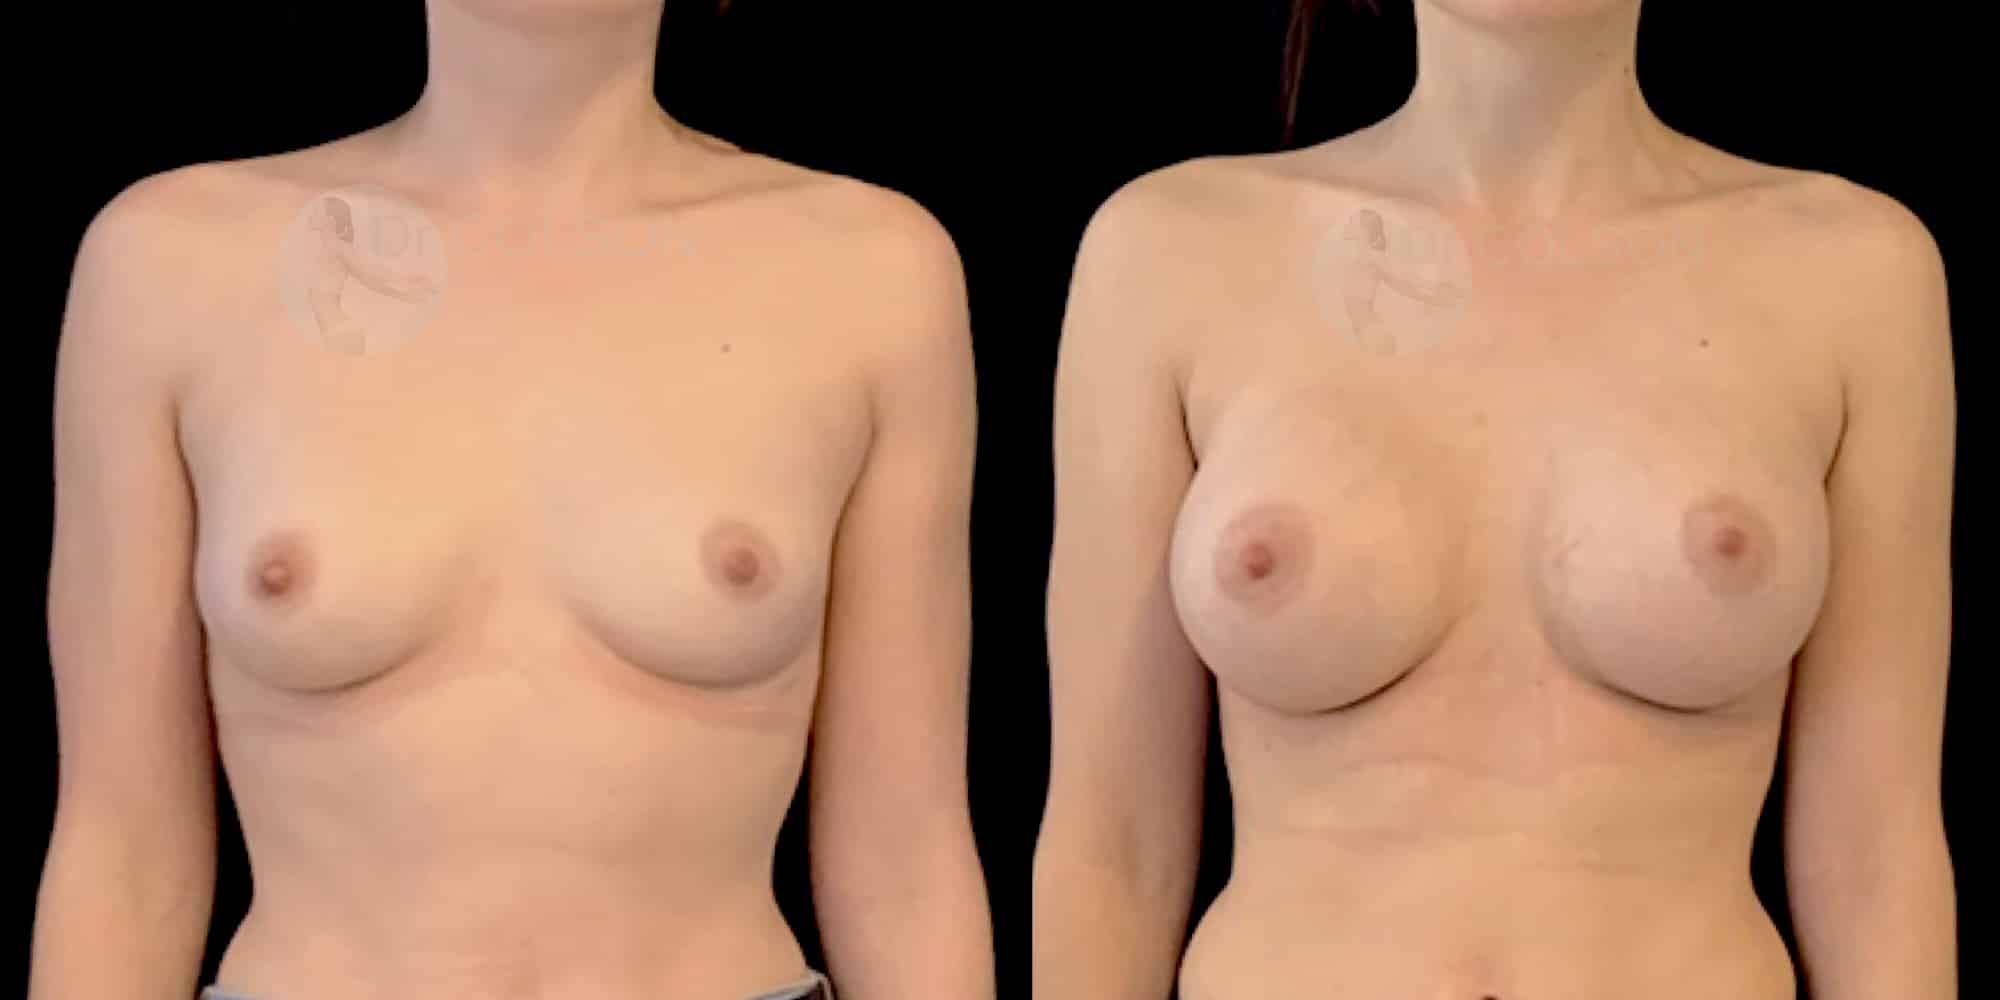 Dr Colson - Chirurgie sein - Augmentation Mammaire Face